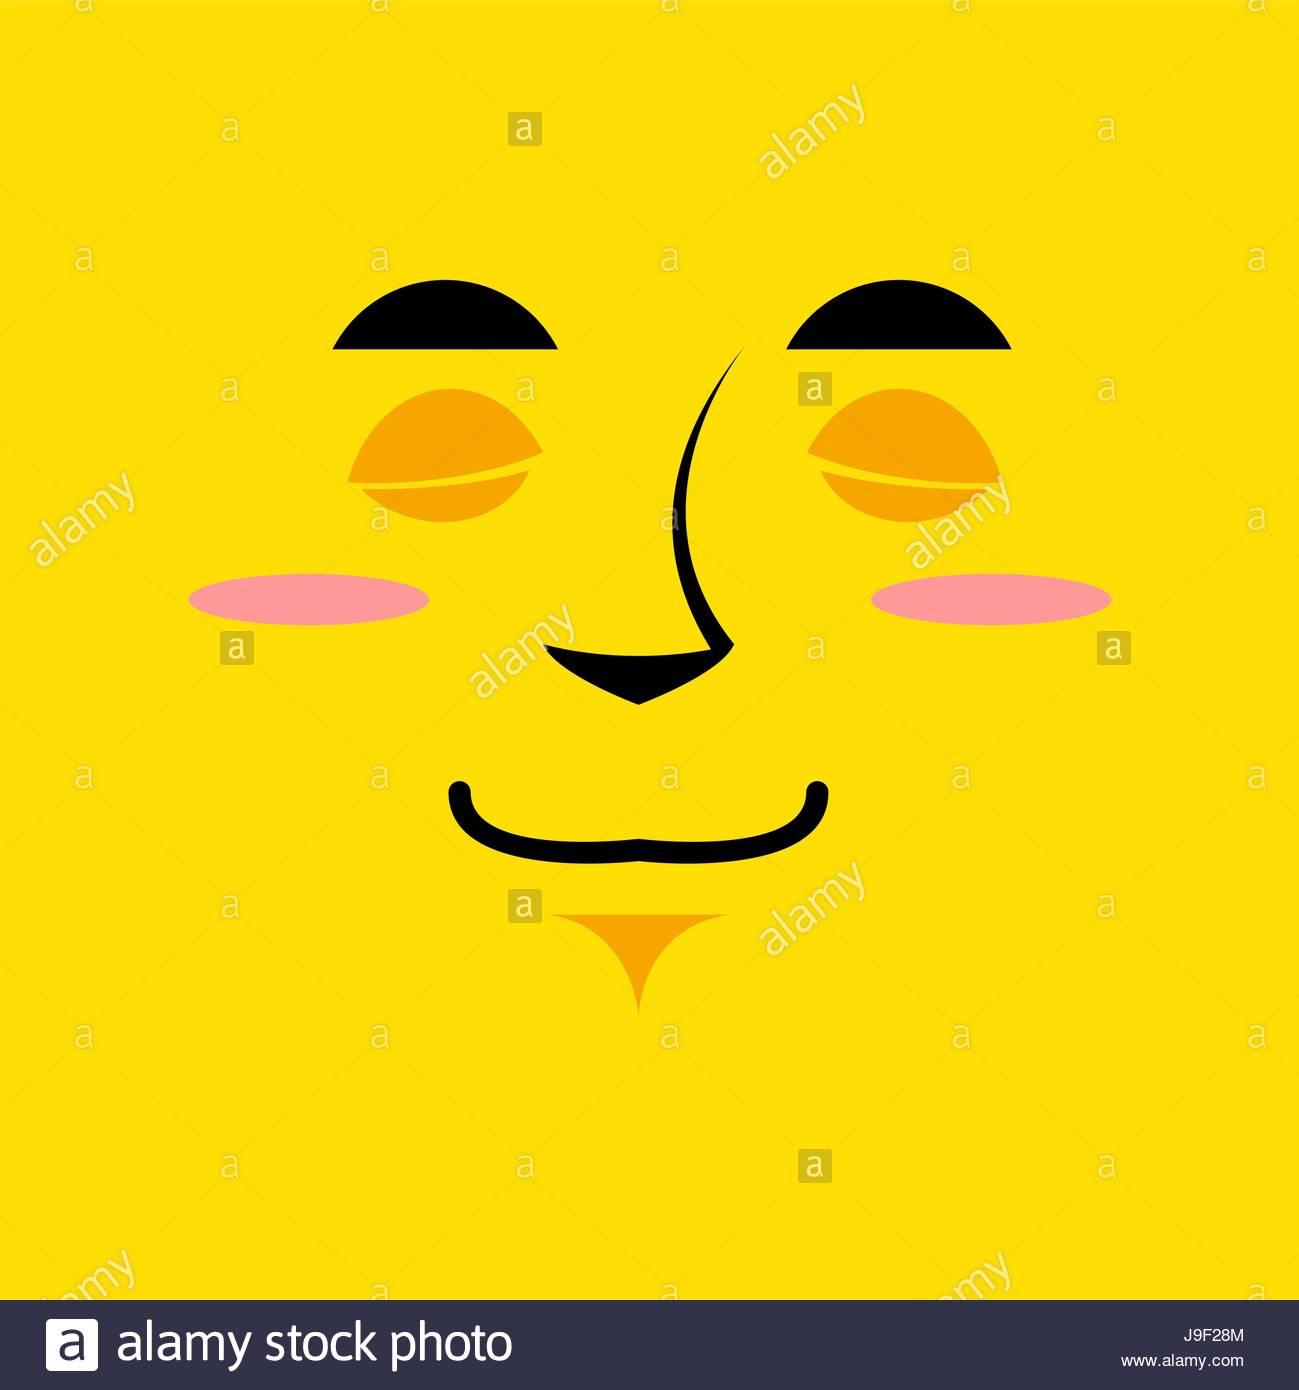 Cartoon cute face an yellow background Gaiety emotion Sleeping 1299x1390